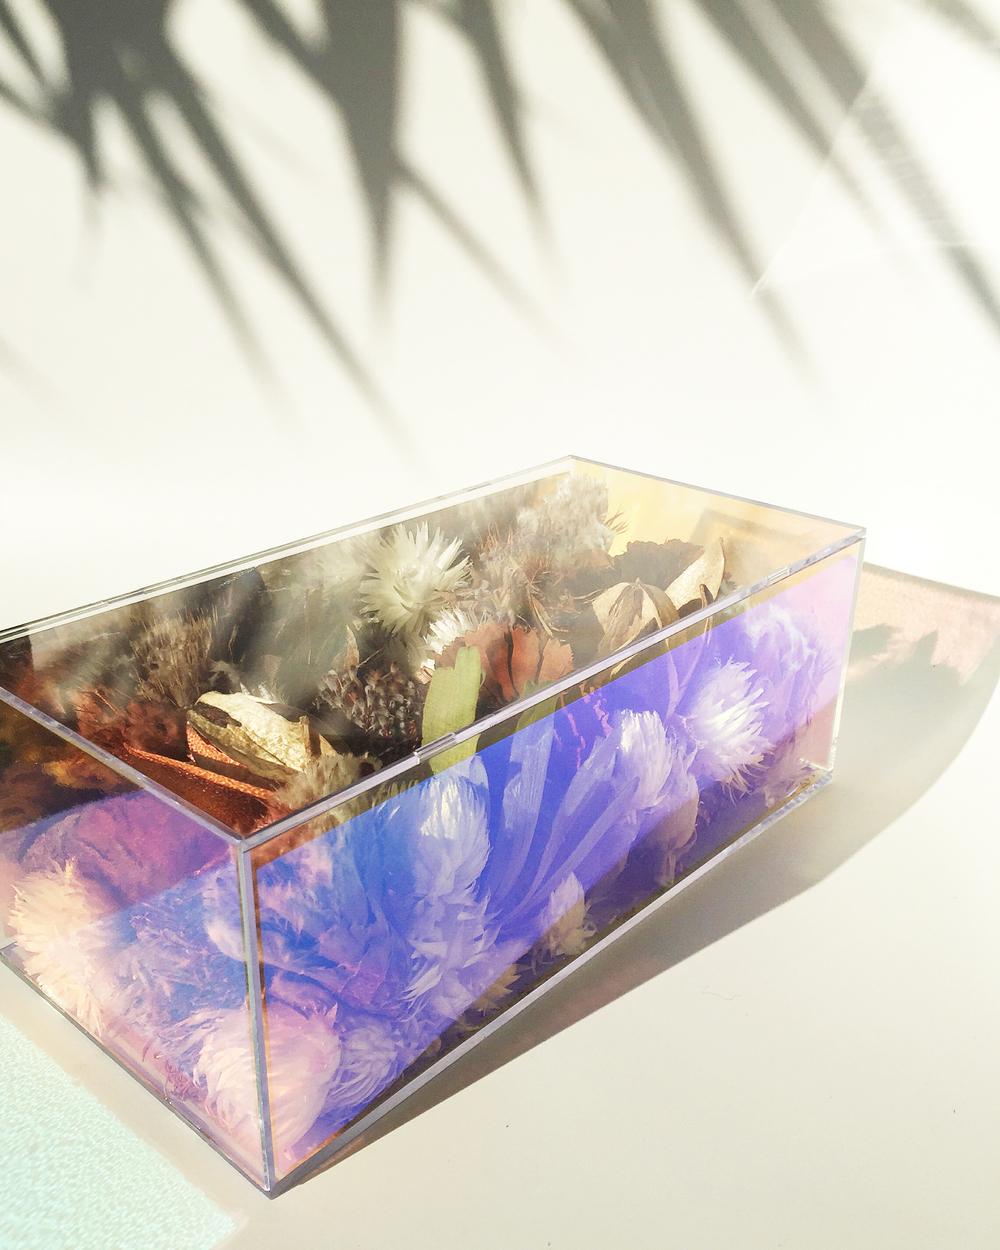 largeflowerbox.jpg